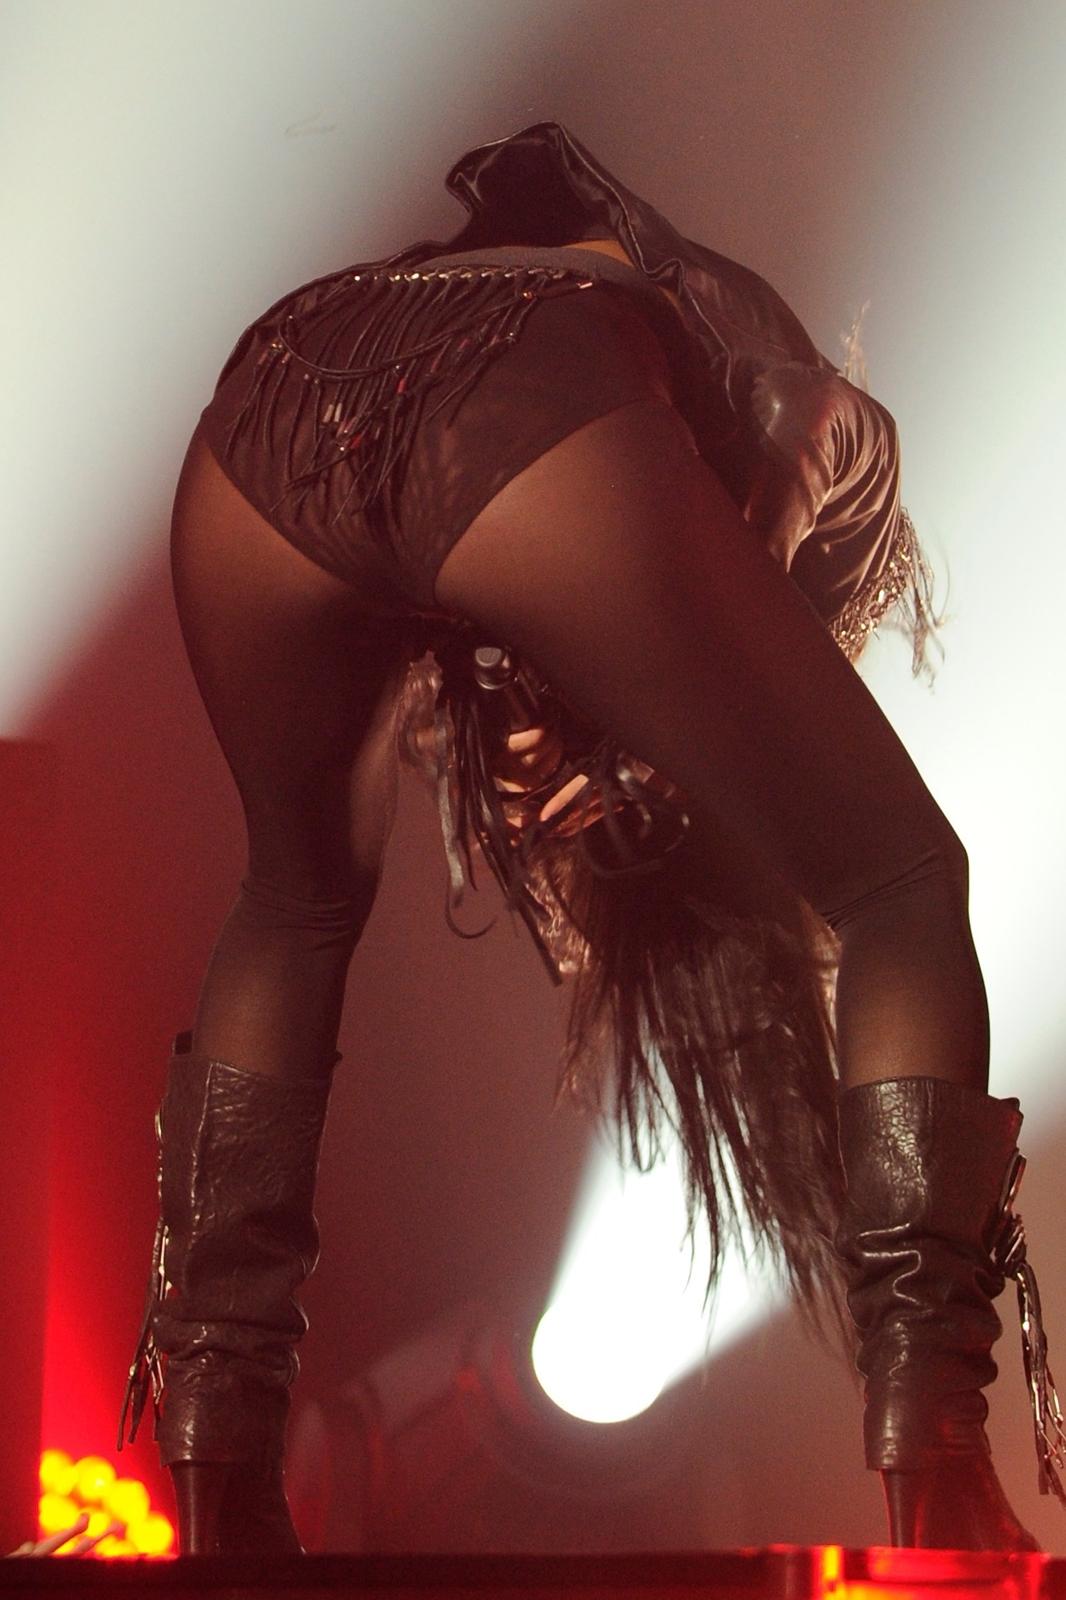 http://2.bp.blogspot.com/-0fN6EniANno/T097zilqvqI/AAAAAAAAKhI/xu0g1rImaq0/s1600/sploogeblog_nicole_scherzinger_cleavage_bra_panties_panrtyhose_boots_5%2B-%2BCopy.jpg